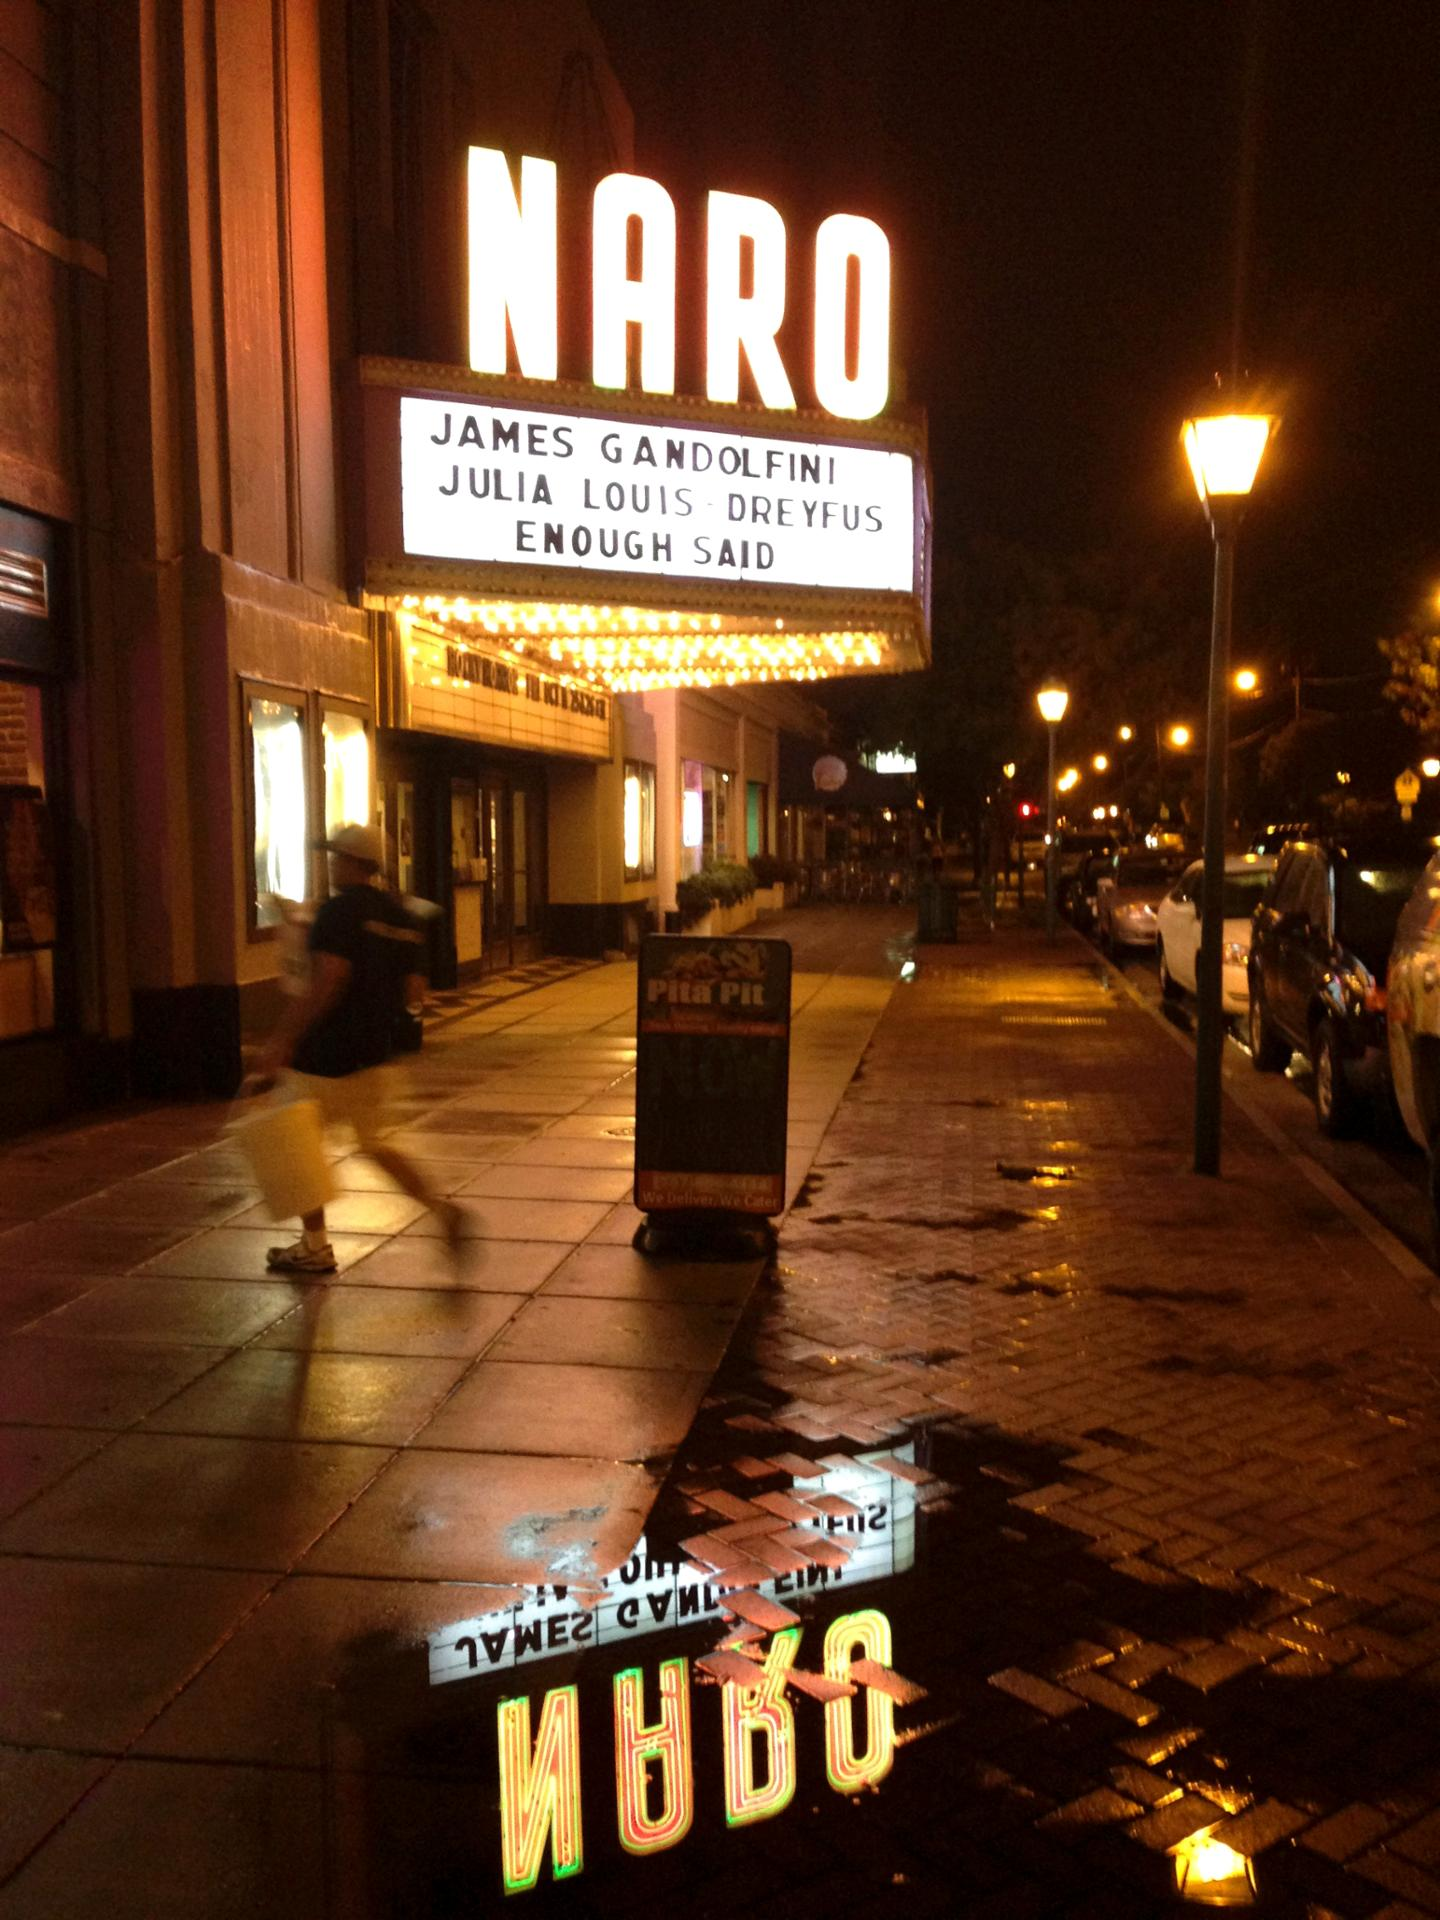 Naro's reflection